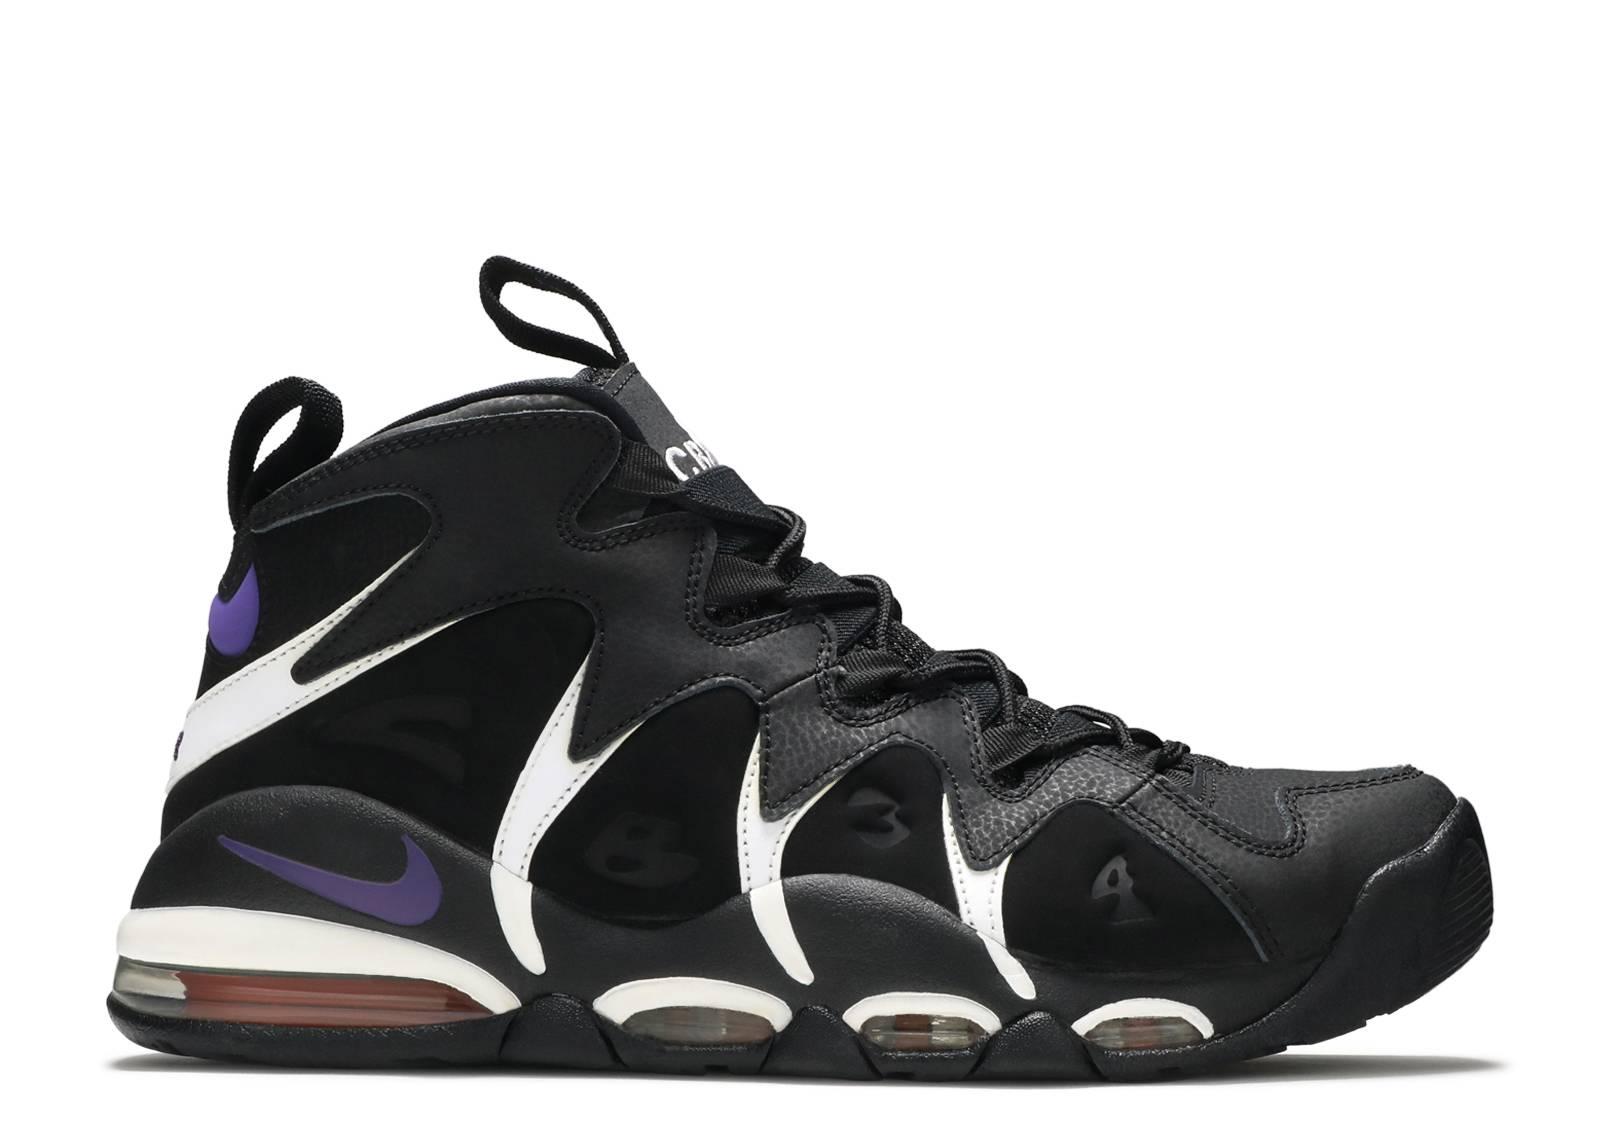 Nike 414243 Tm Purple Max Blackclub Orng Air Blk Cb34 002 wqRxFa 6e7a4b795d11